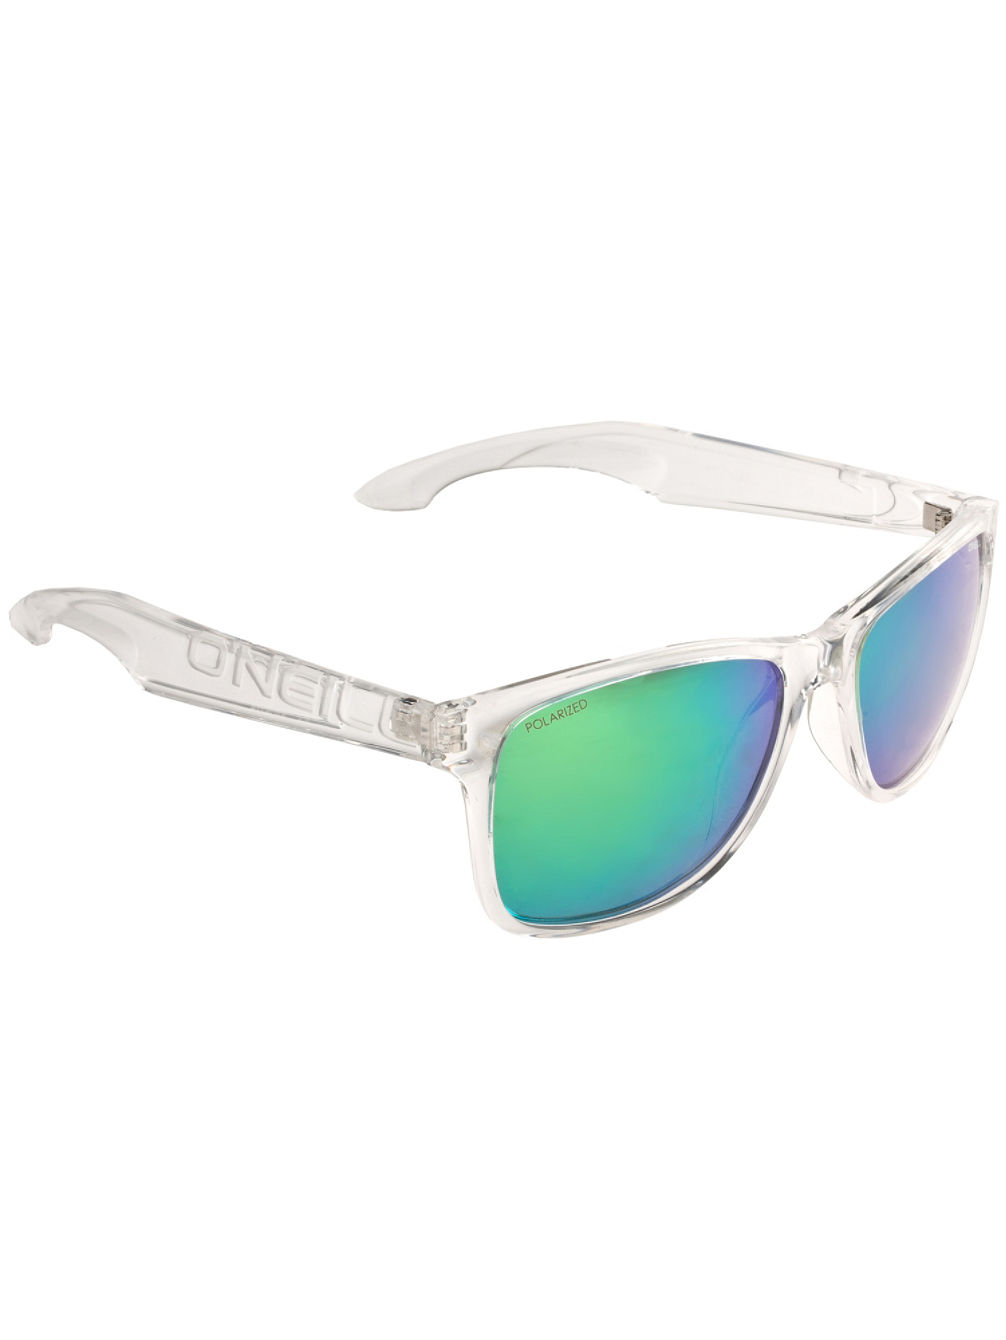 o-neill-eyewear-shore-gloss-clear-crystal